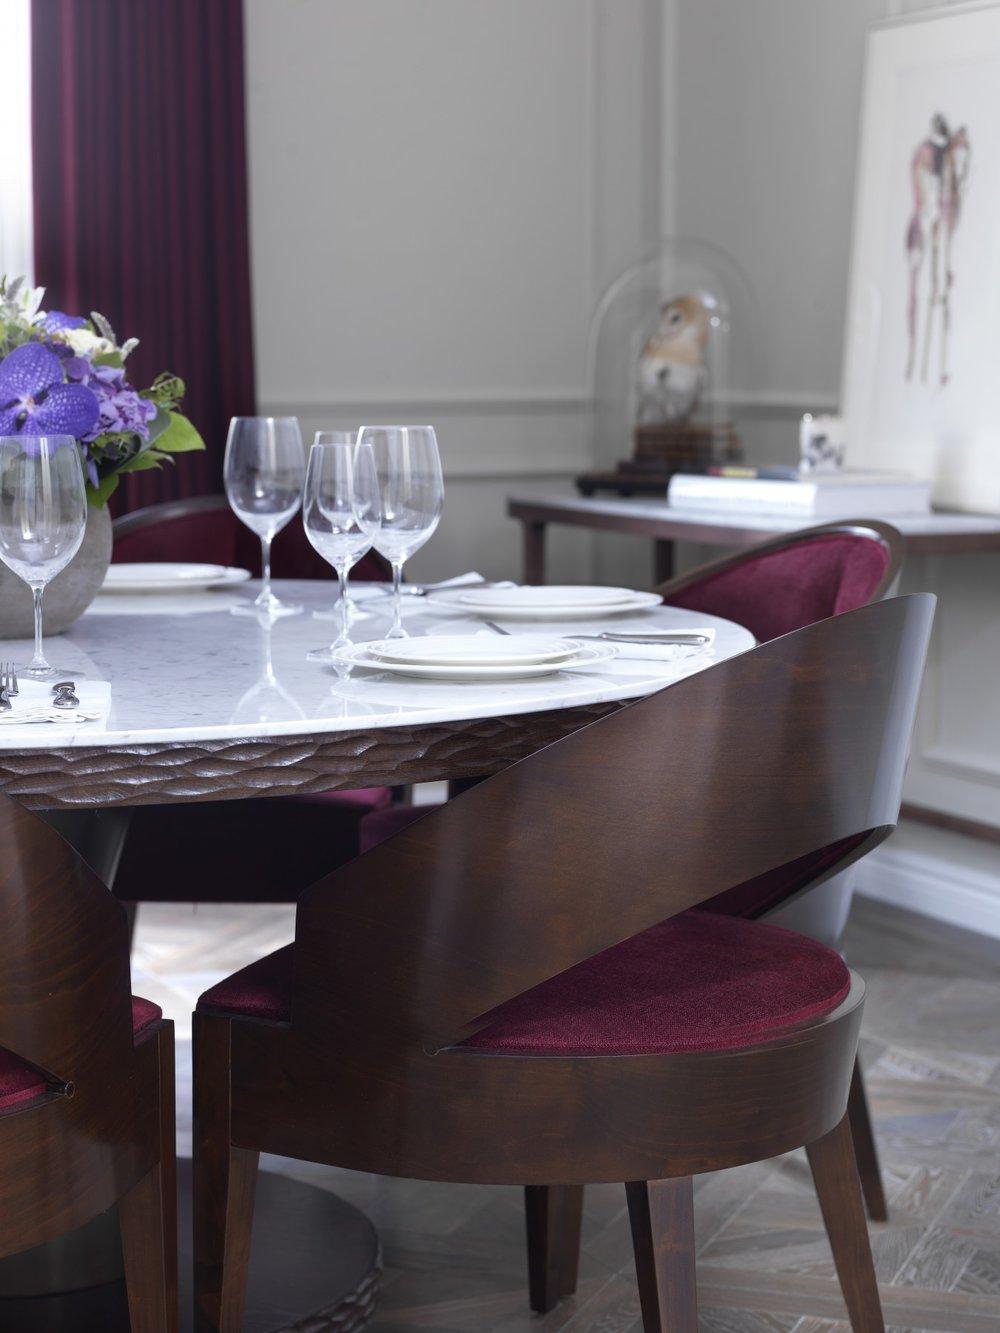 diningroom deatil1.jpg